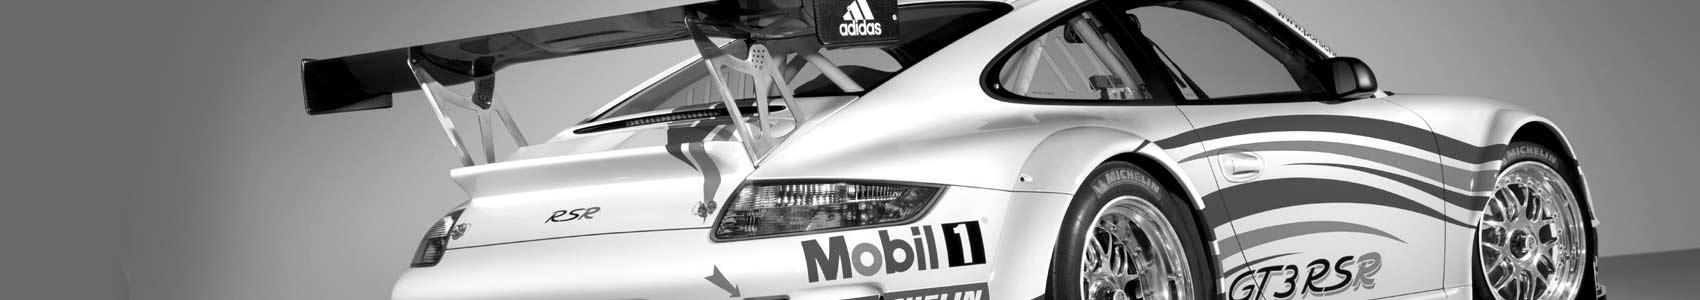 » Northern Ireland Car Dismantlers Car Parts & Breakers